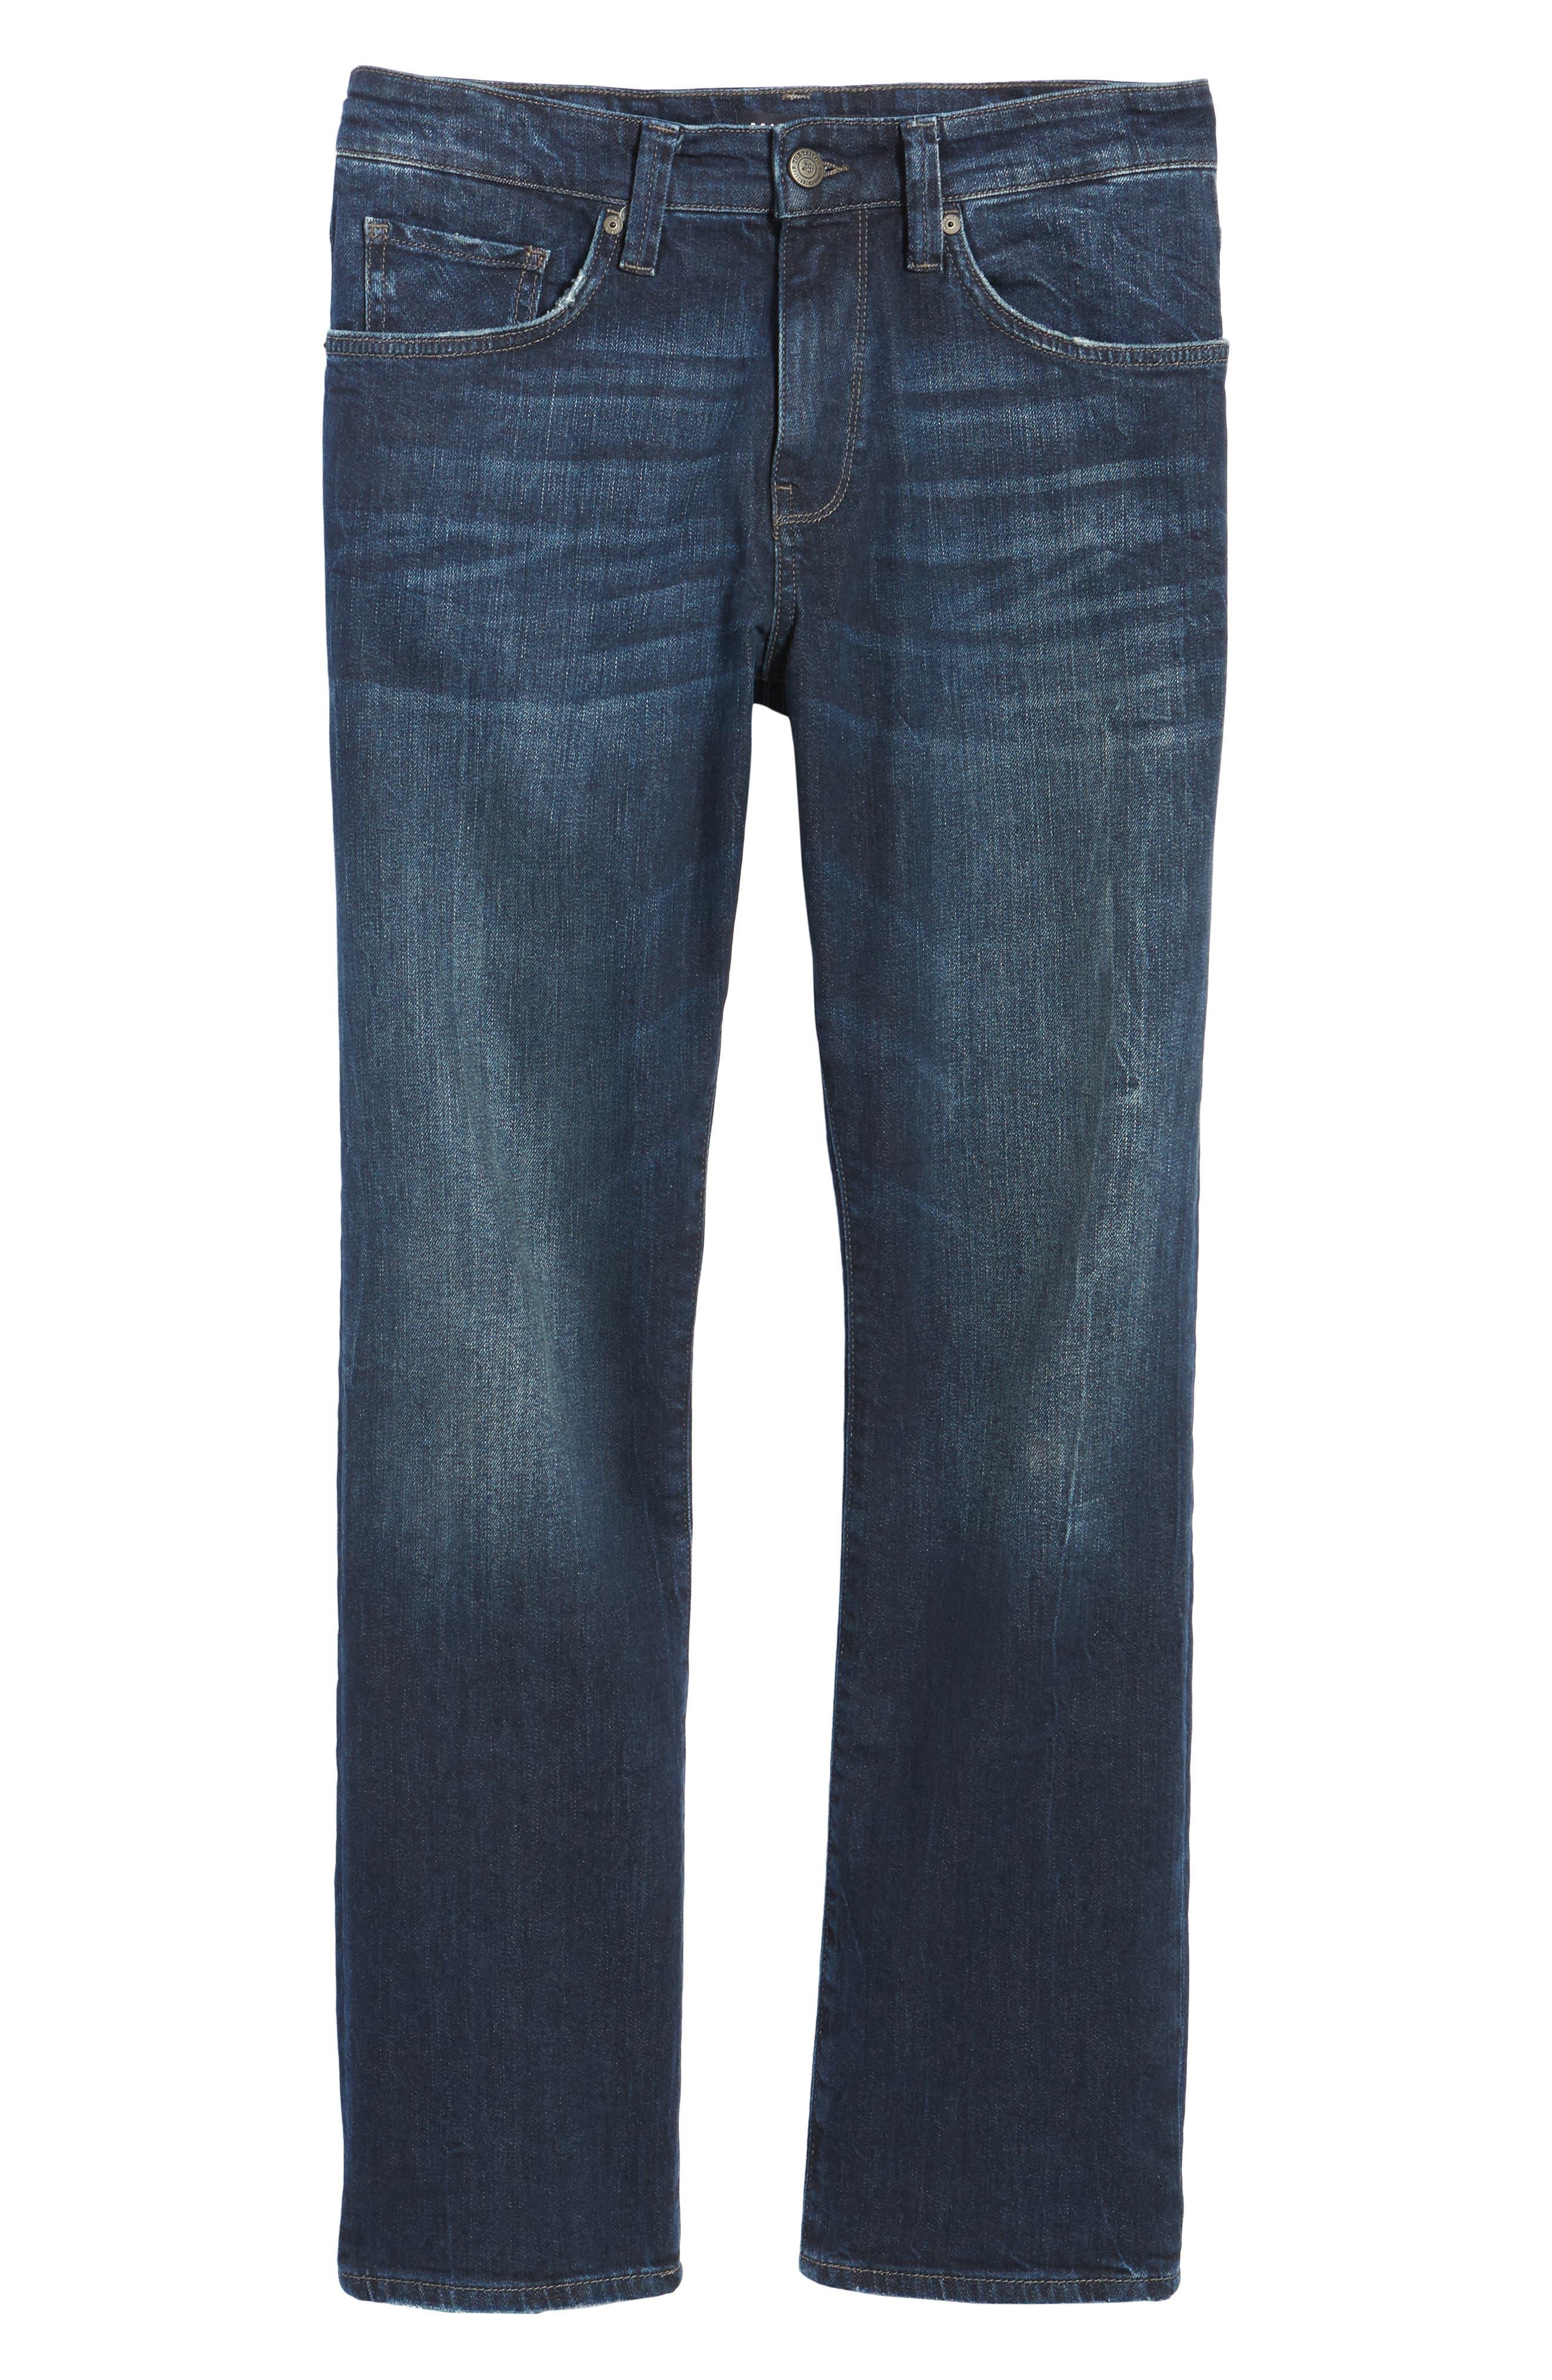 MAVI JEANS,                             Myles Straight Leg Jeans,                             Alternate thumbnail 6, color,                             401